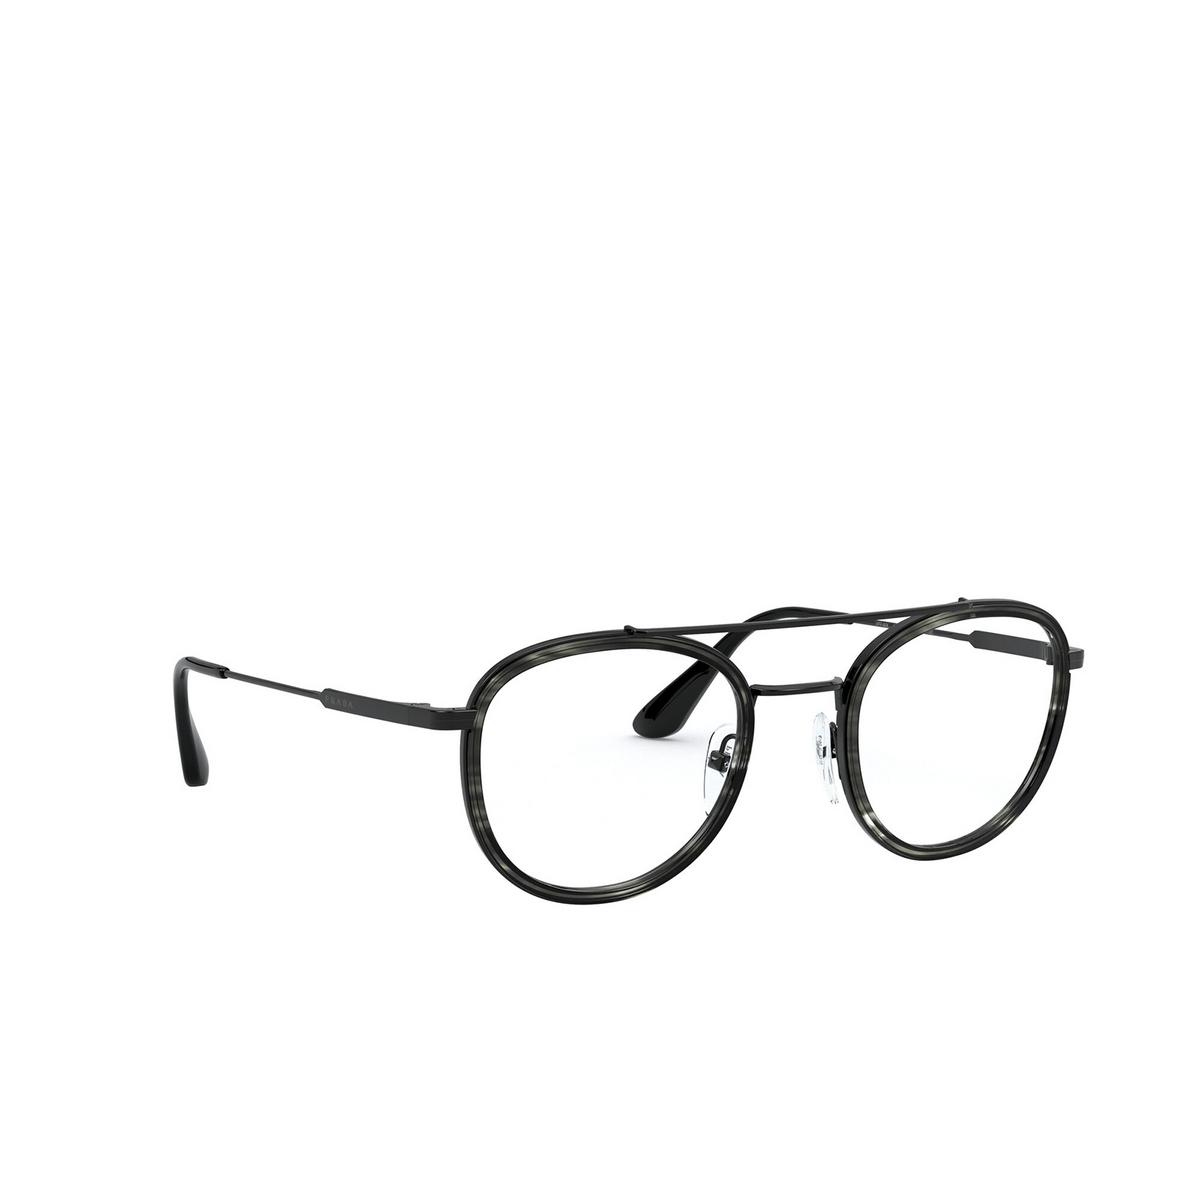 Prada® Round Eyeglasses: PR 66XV color Striped Grey / Black 05A1O1.